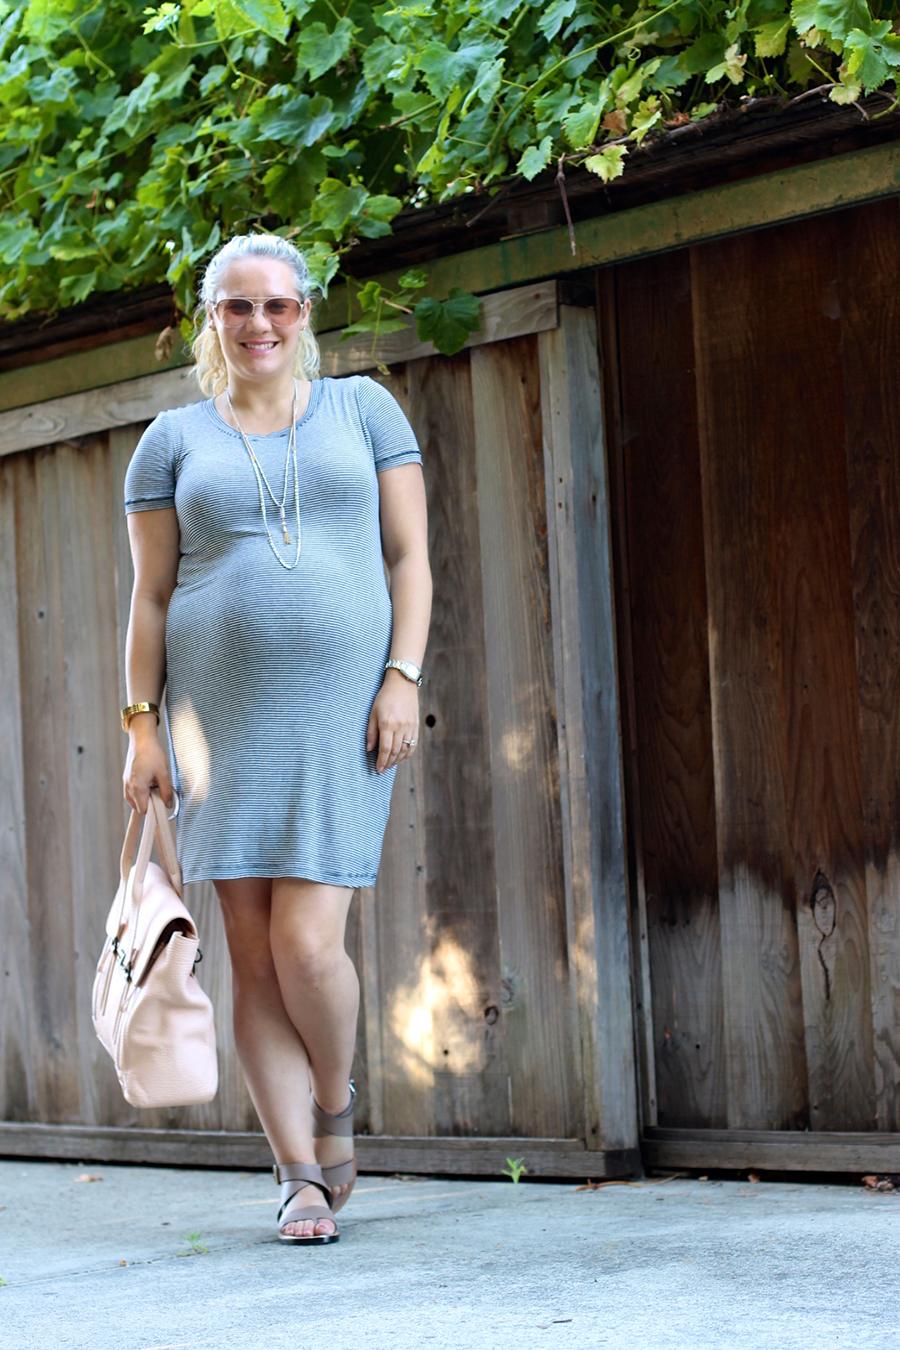 Splendid Stripe Shirt Dress-4th of July-Have Need Want-Maternity Style